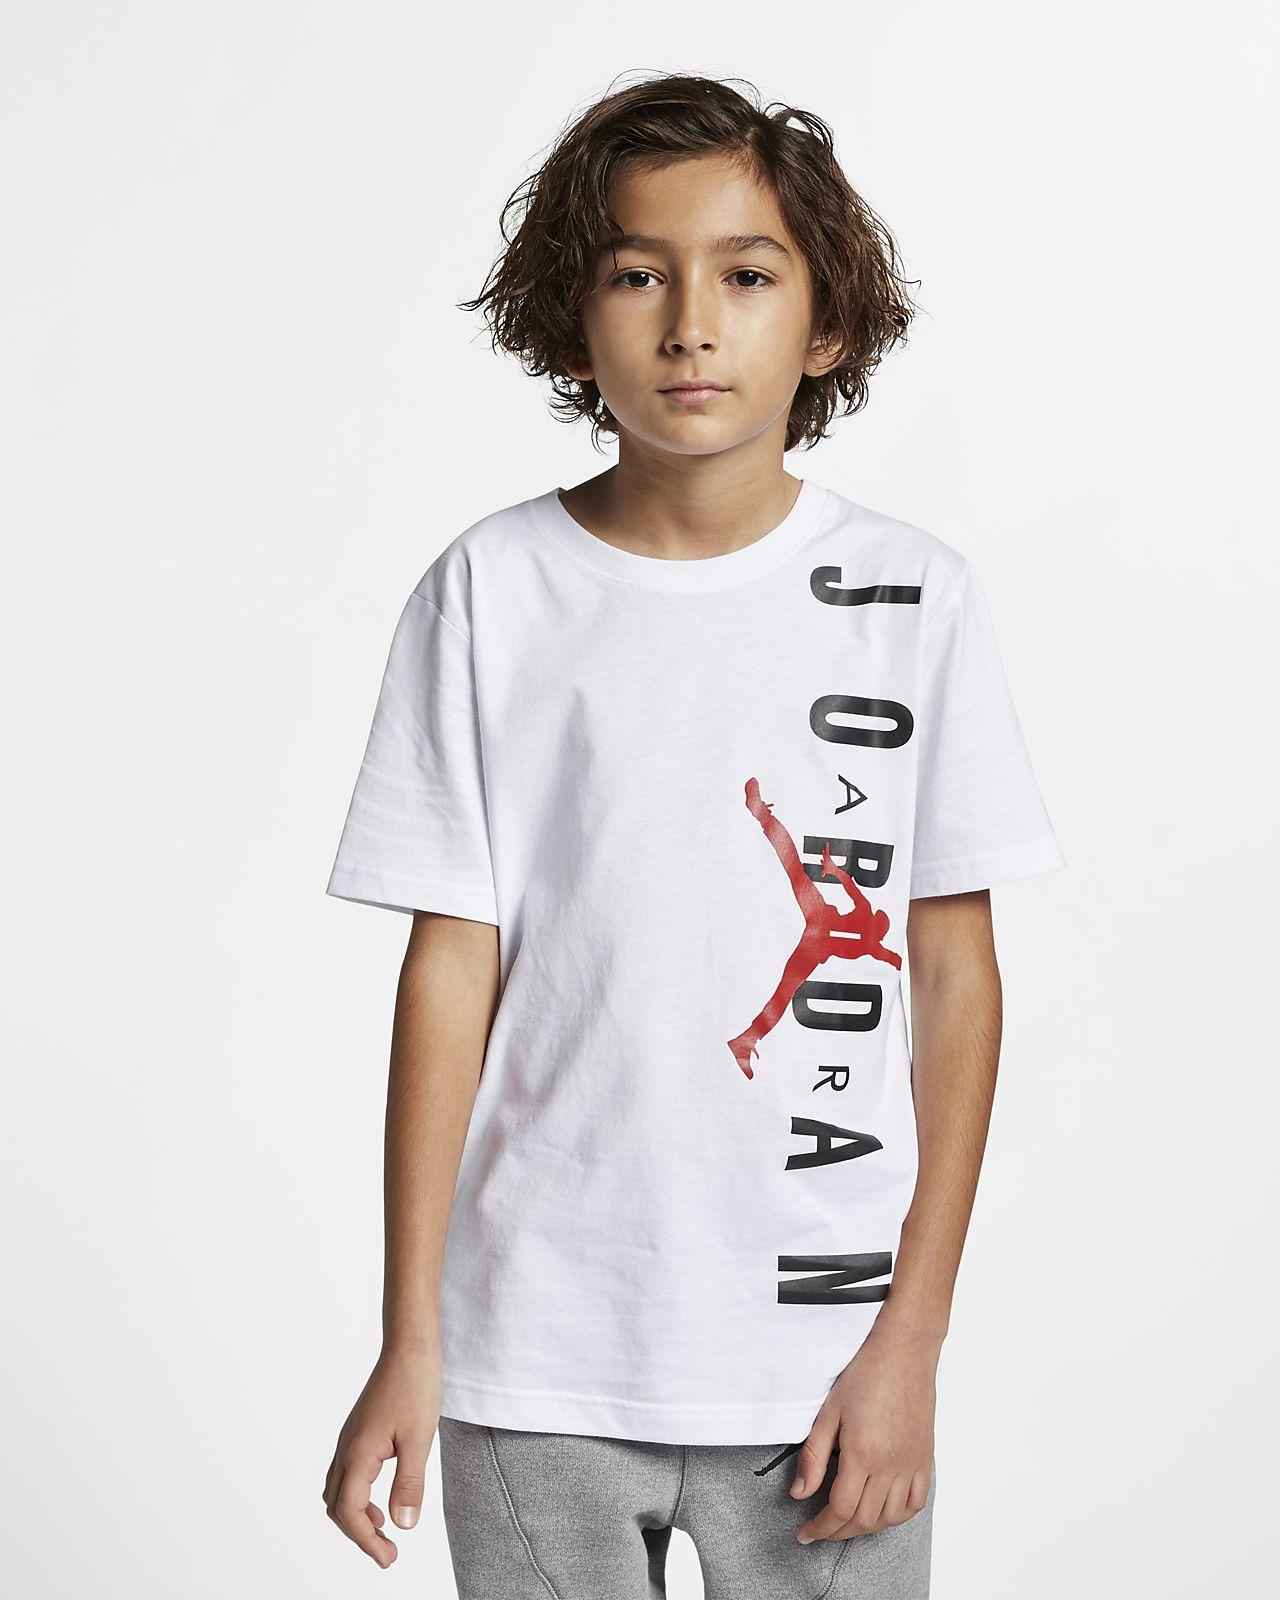 e5a6dad76500 Jordan Jumpman Air Older Kids  (Boys ) T-Shirt. Nike.com GB